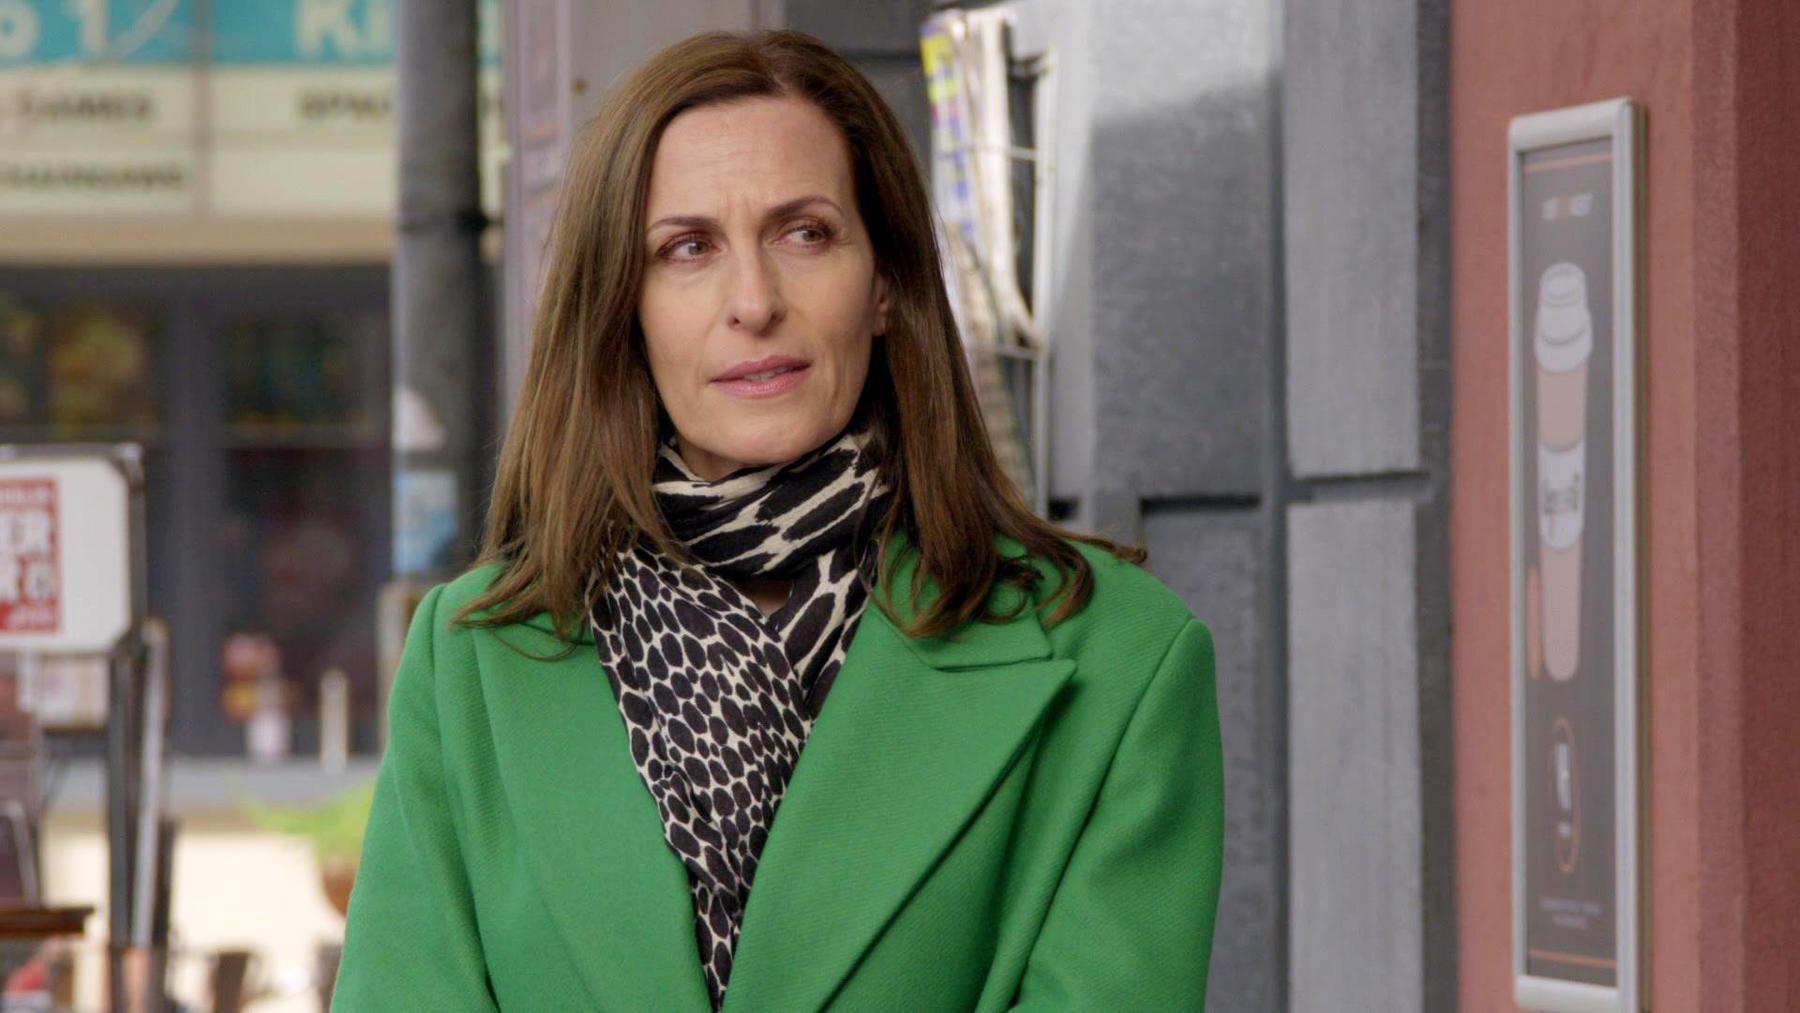 Katrin wundert sich über Melanies seltsames Verhalten